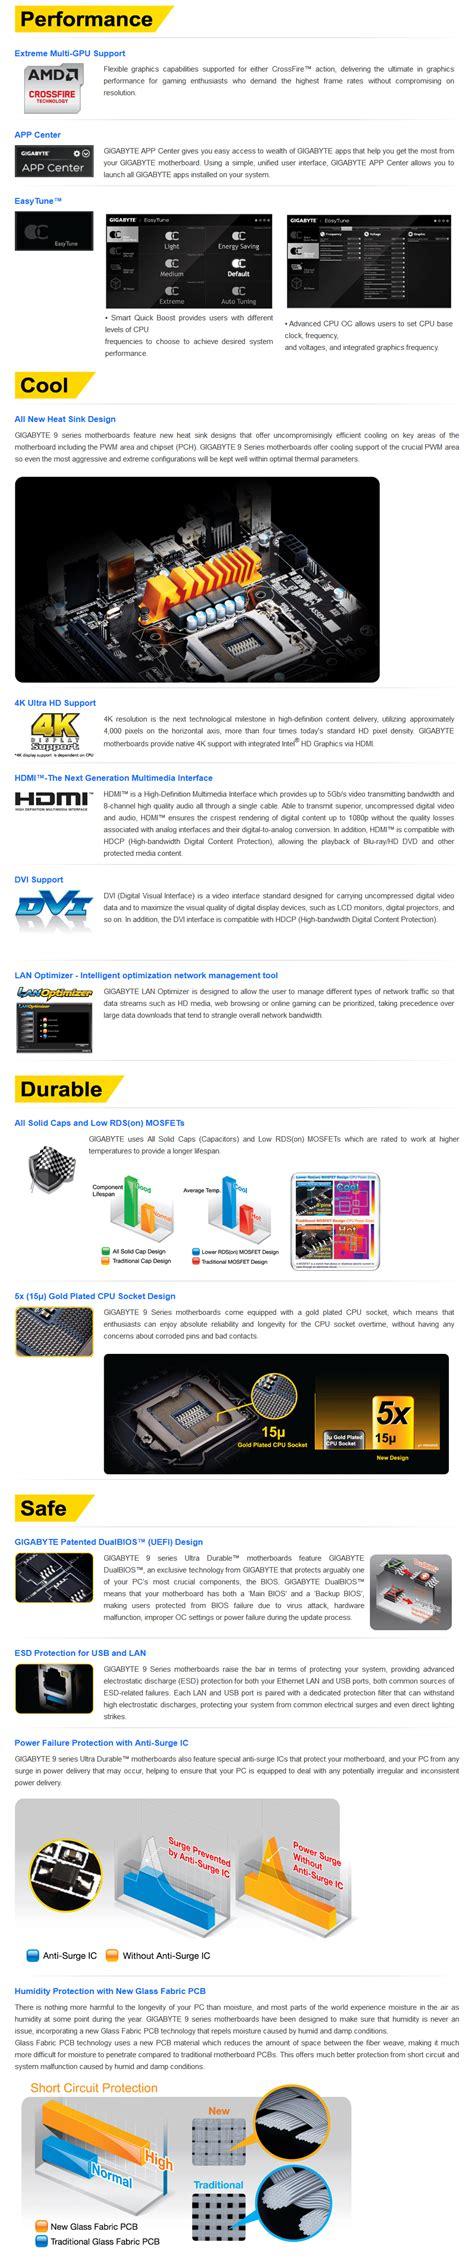 Motherboard Gigabyte Ga Z97m D3h Z97 4x Ddr3 Vgam Atx 1150 So gigabyte ga z97m d3h motherboard ga z97m d3h 159 00